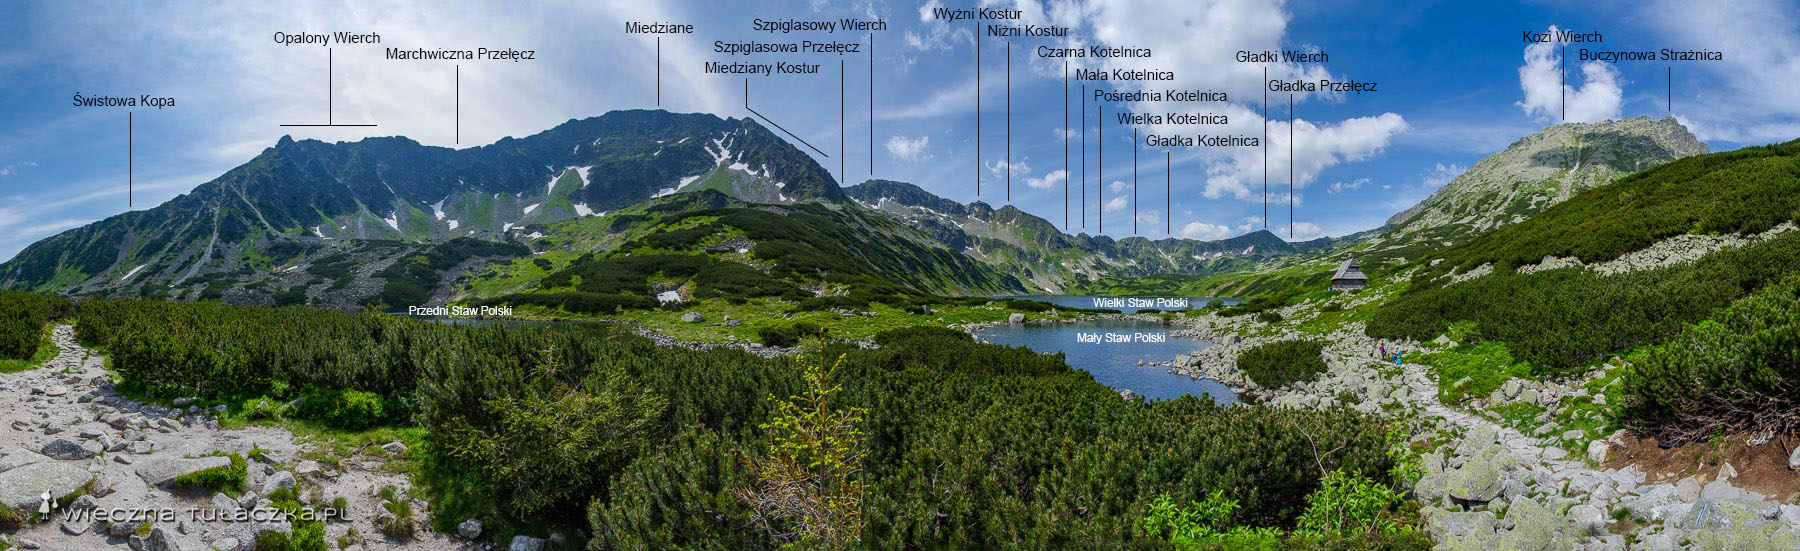 Panorama Doliny Pięciu Stawów